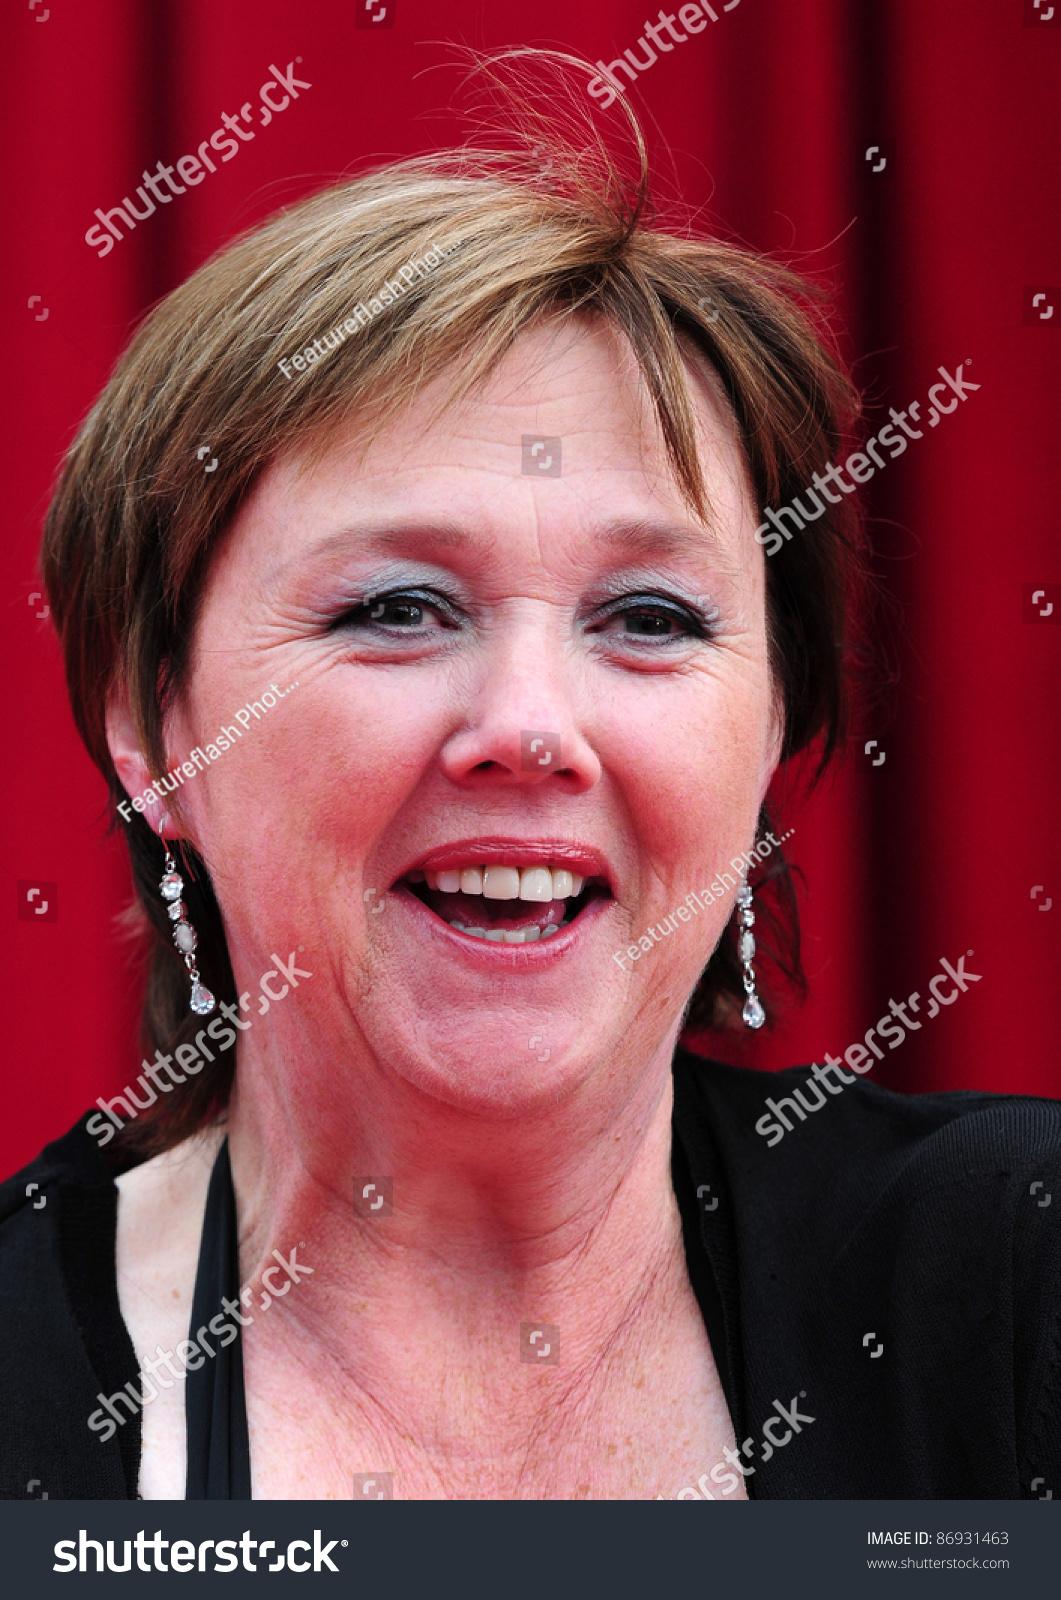 Kelli Goss,Bridget Hall USA 1998, 2001-2002 Adult video Louise Brealey,Isabel Granada (1976?017)